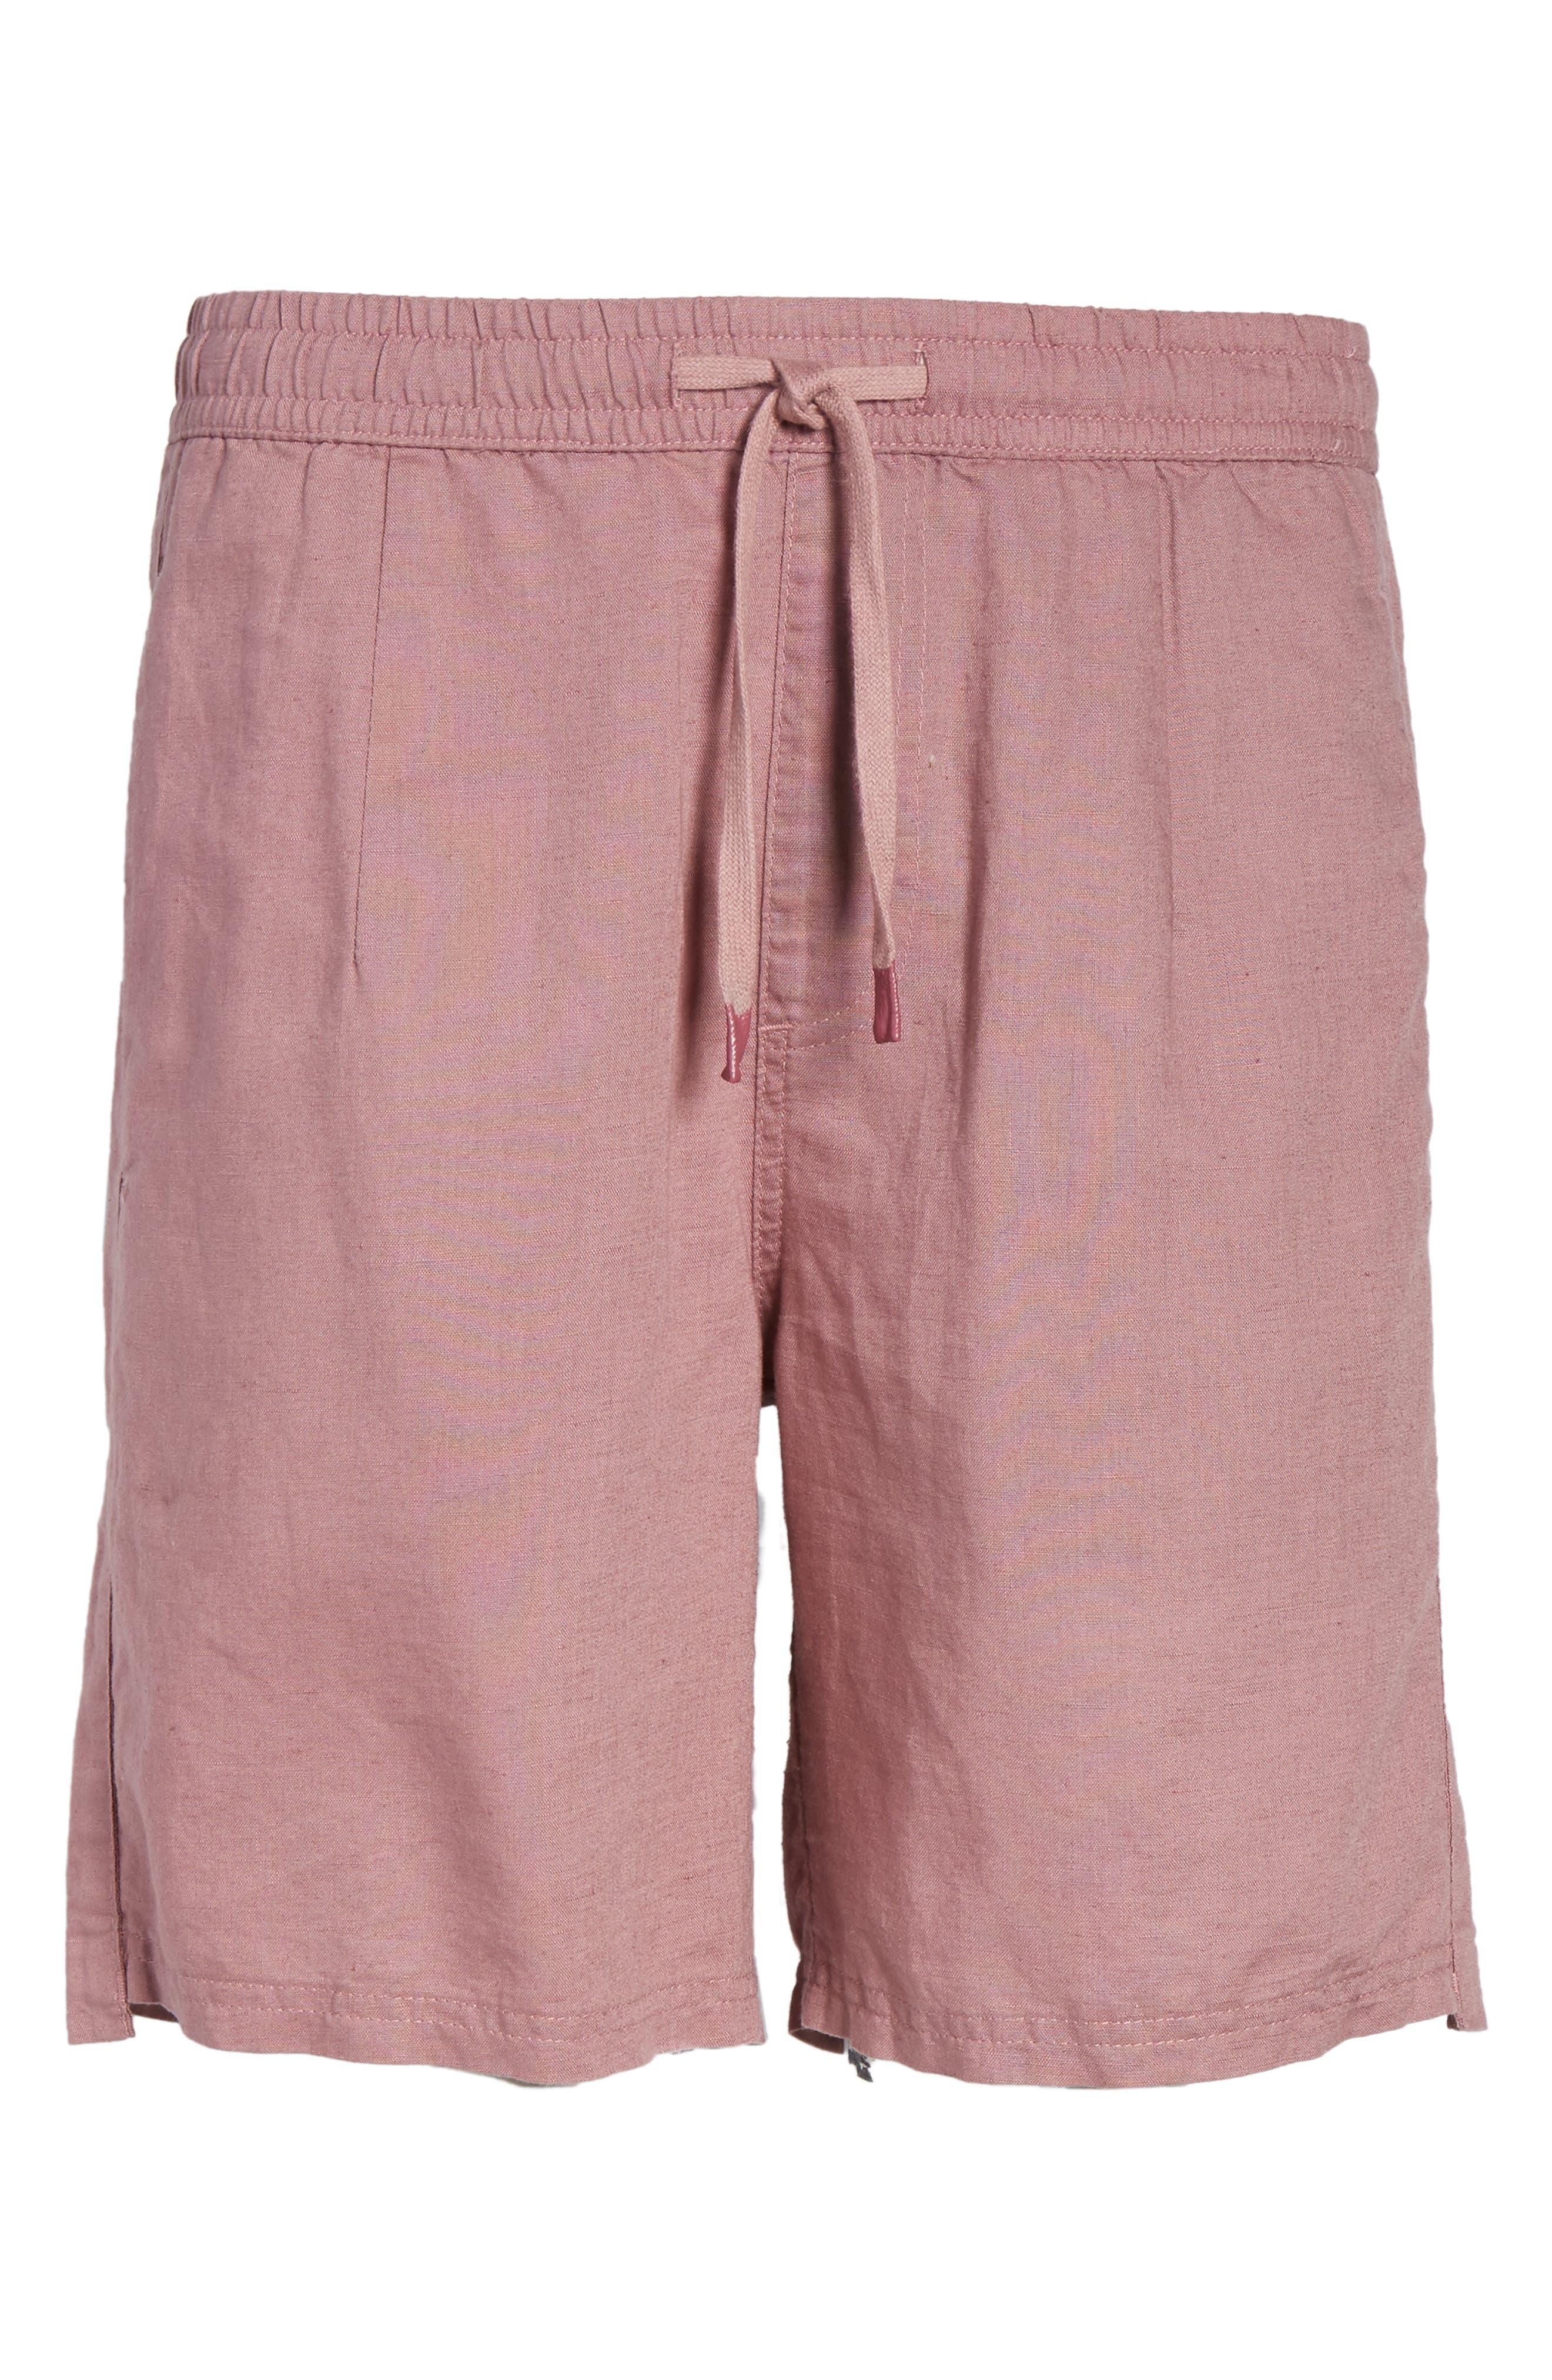 Omni Linen Blend Shorts,                             Alternate thumbnail 16, color,